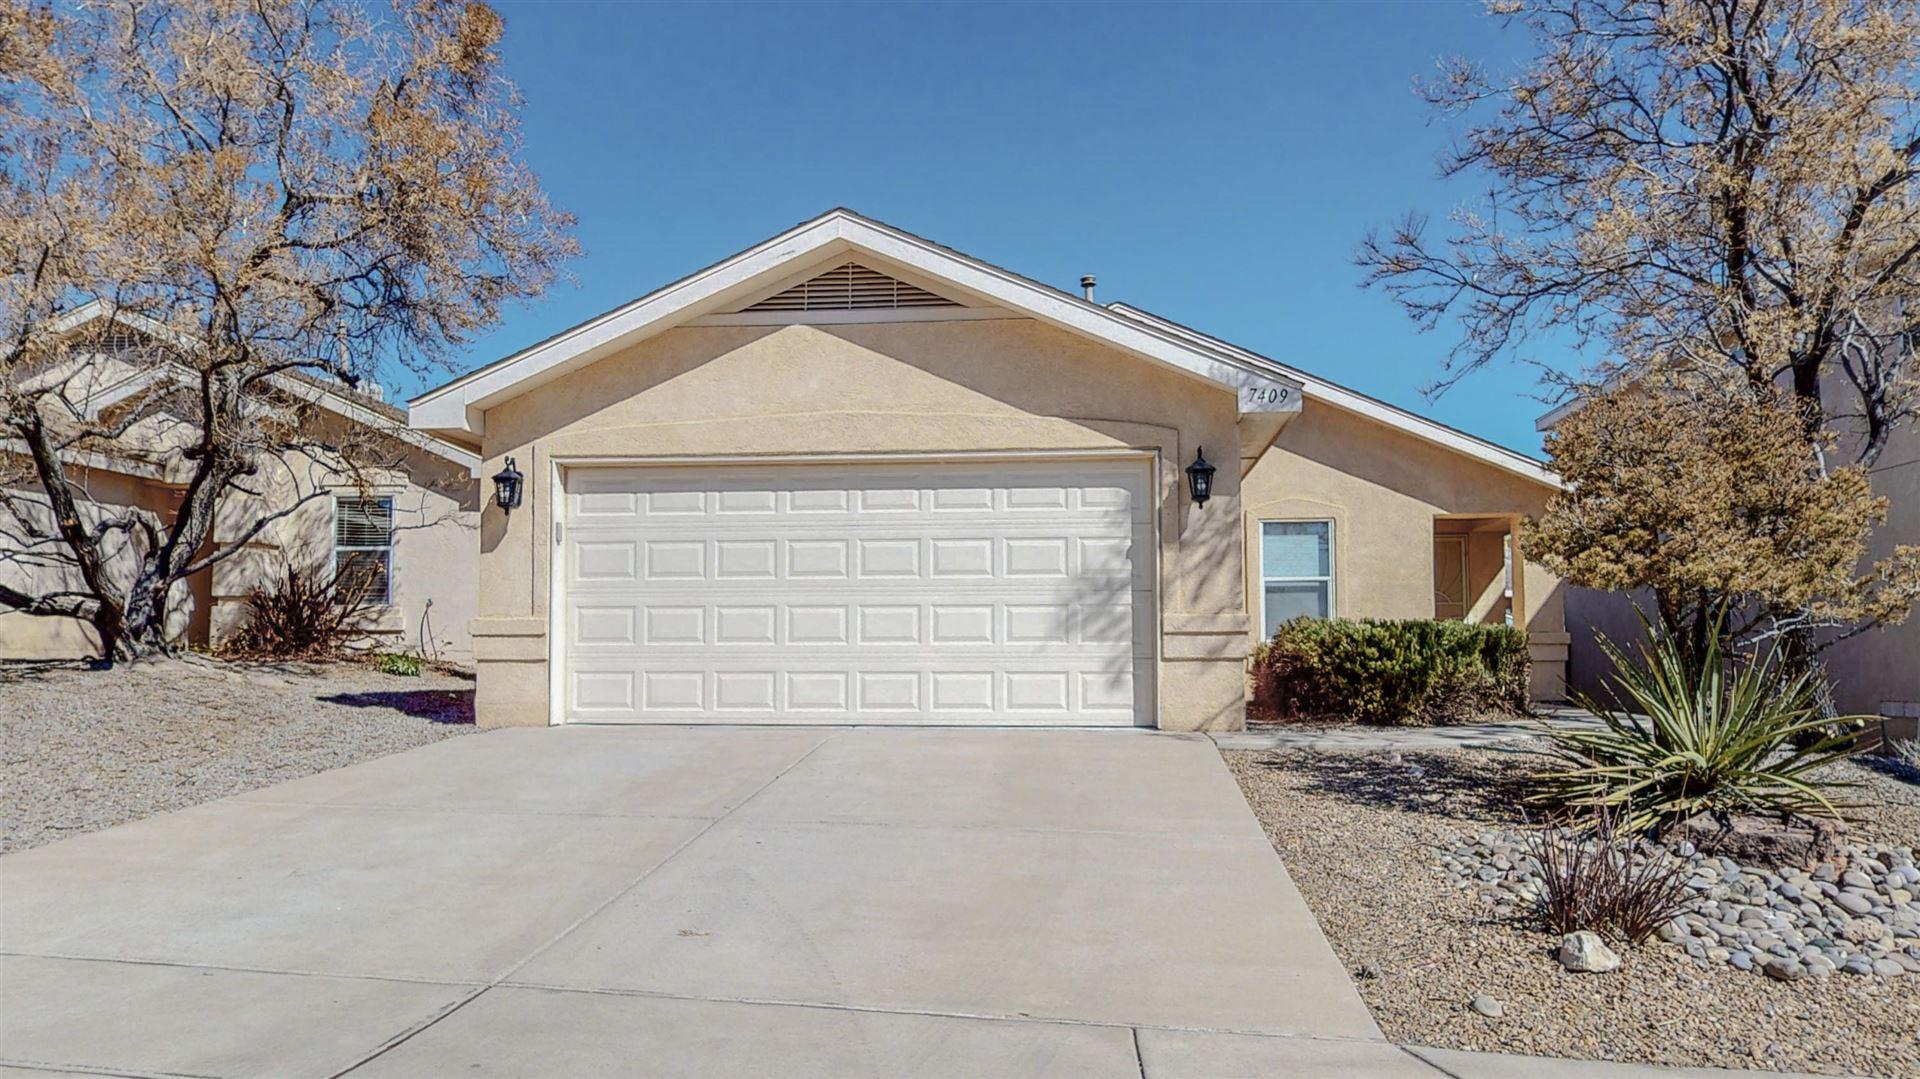 7409 WINSLOW Place NW, Albuquerque, NM 87114 - MLS#: 986658